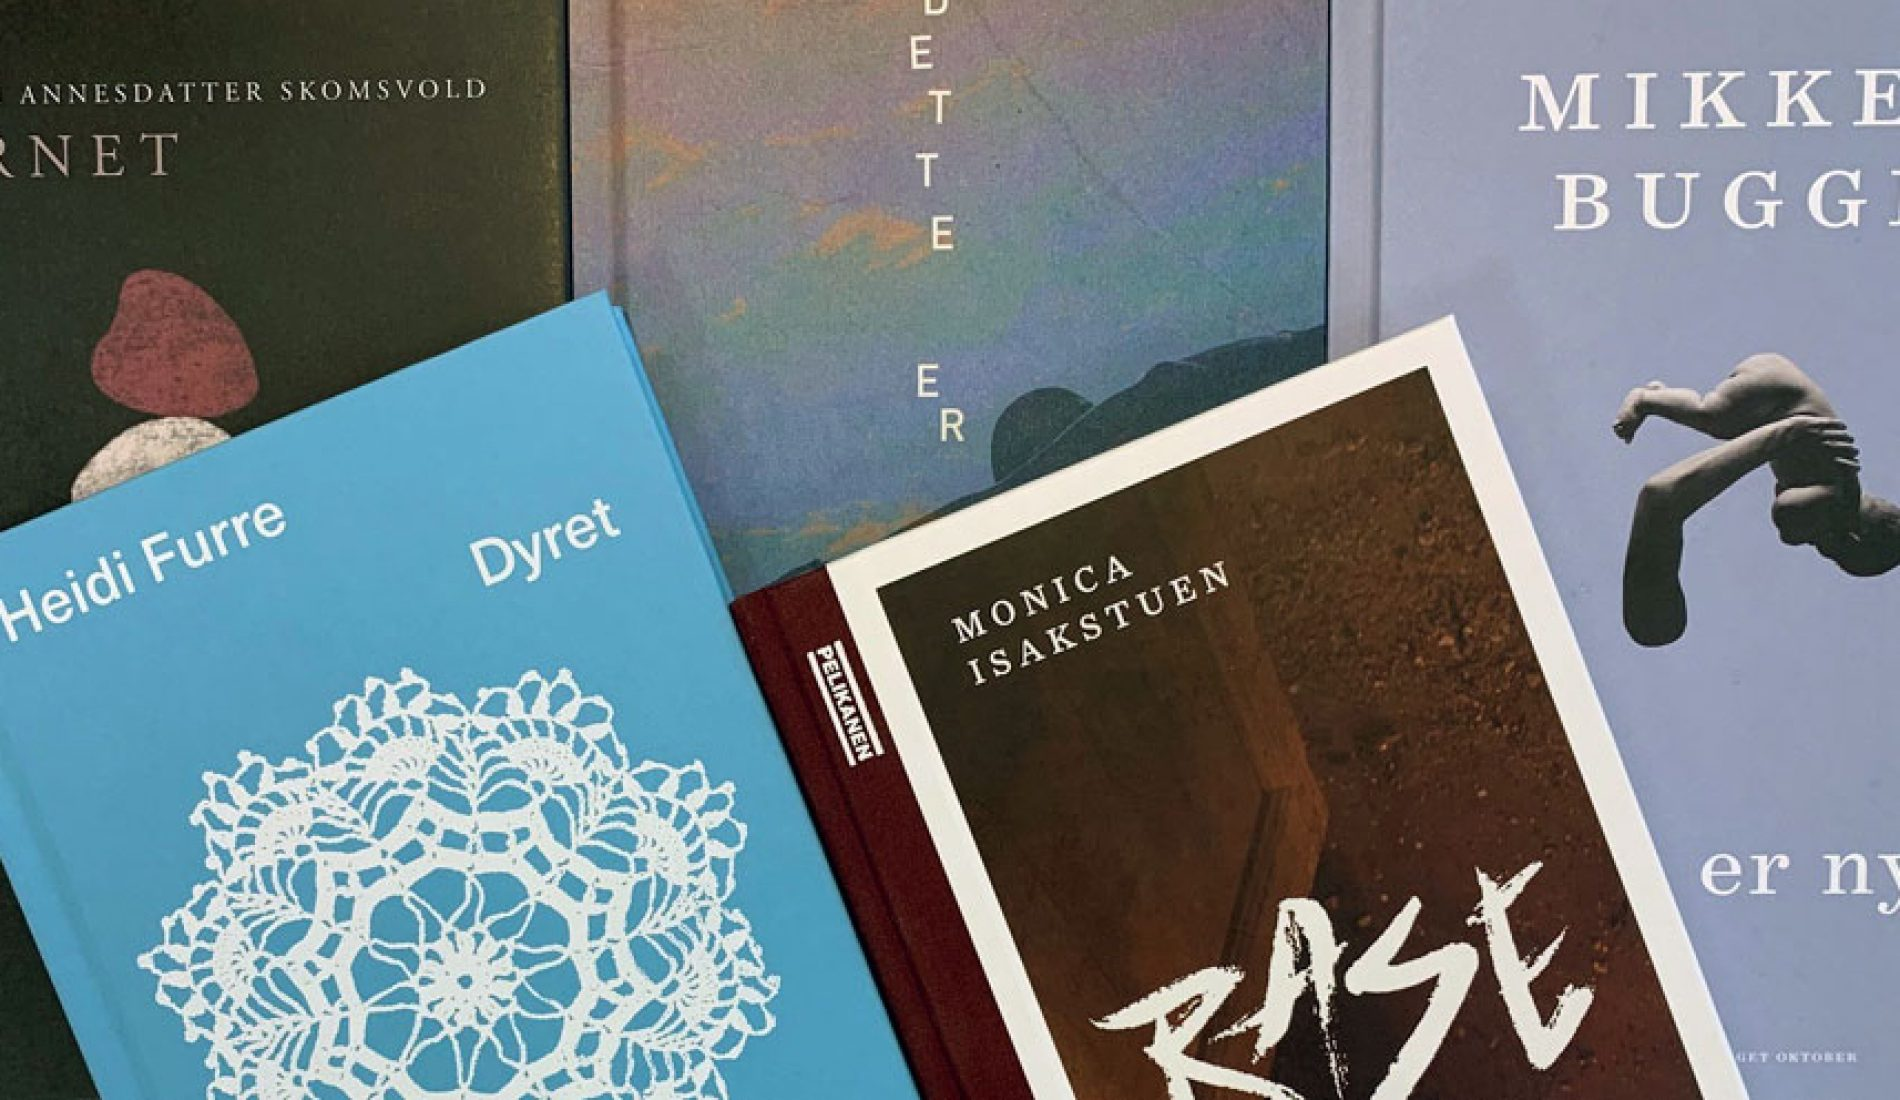 I høst har det kommet flere romaner som tematiserer graviditet og barsel.